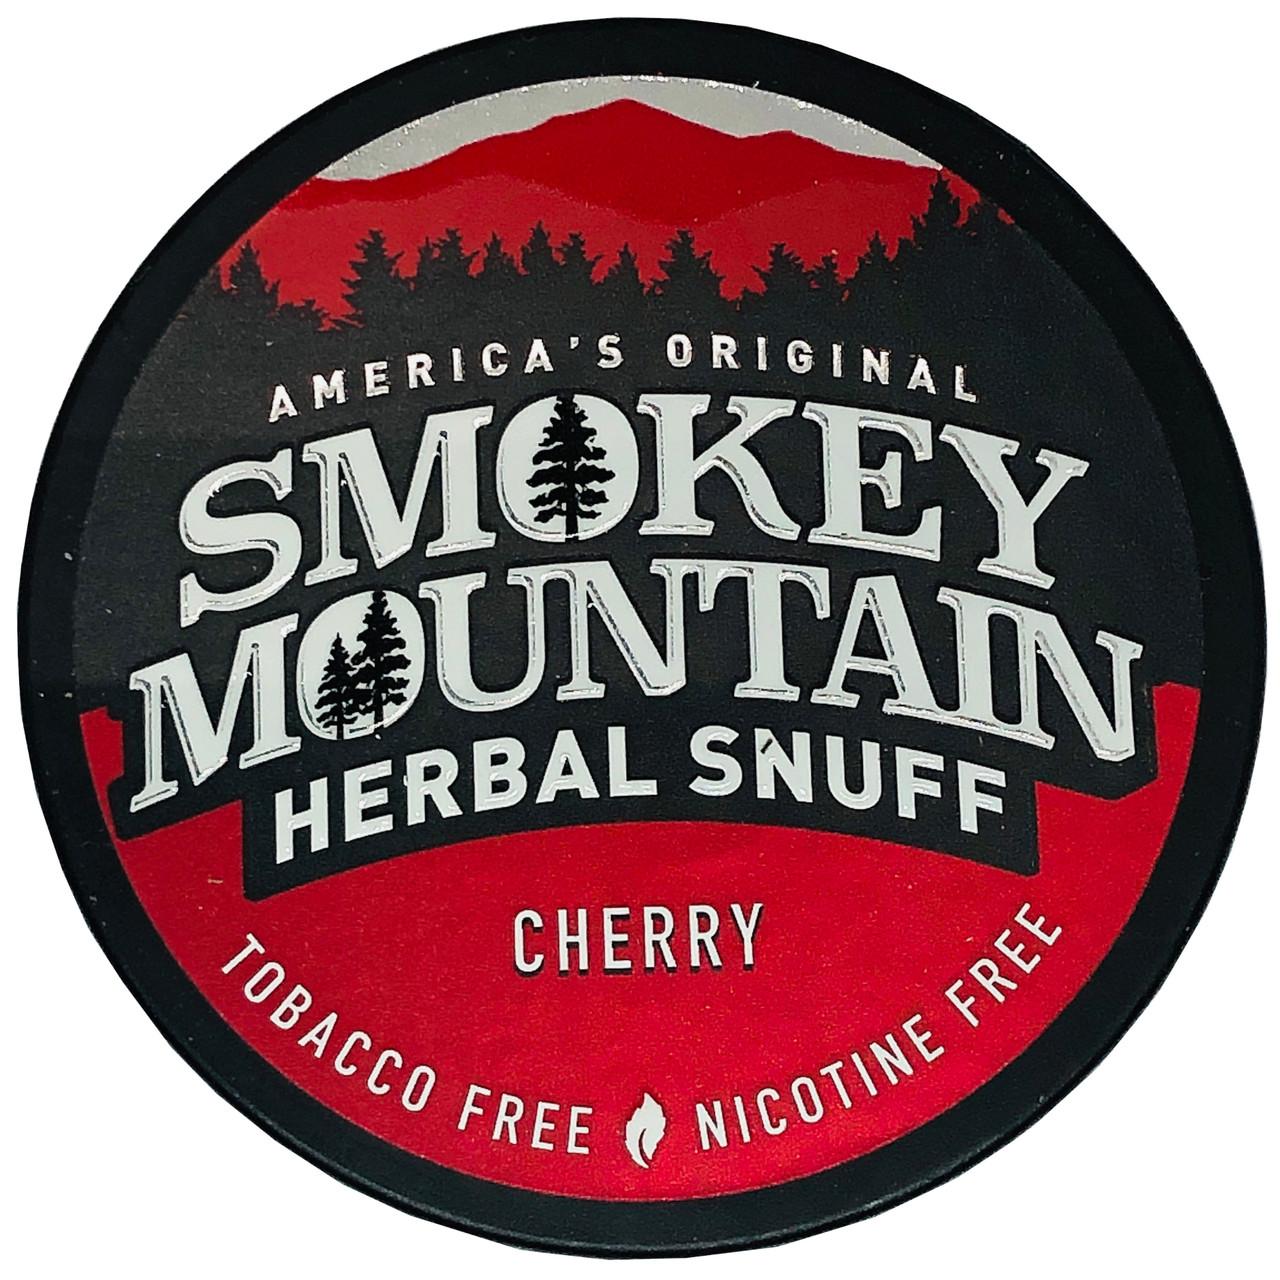 Smokey Mountain Herbal Snuff Cherry 1 Can